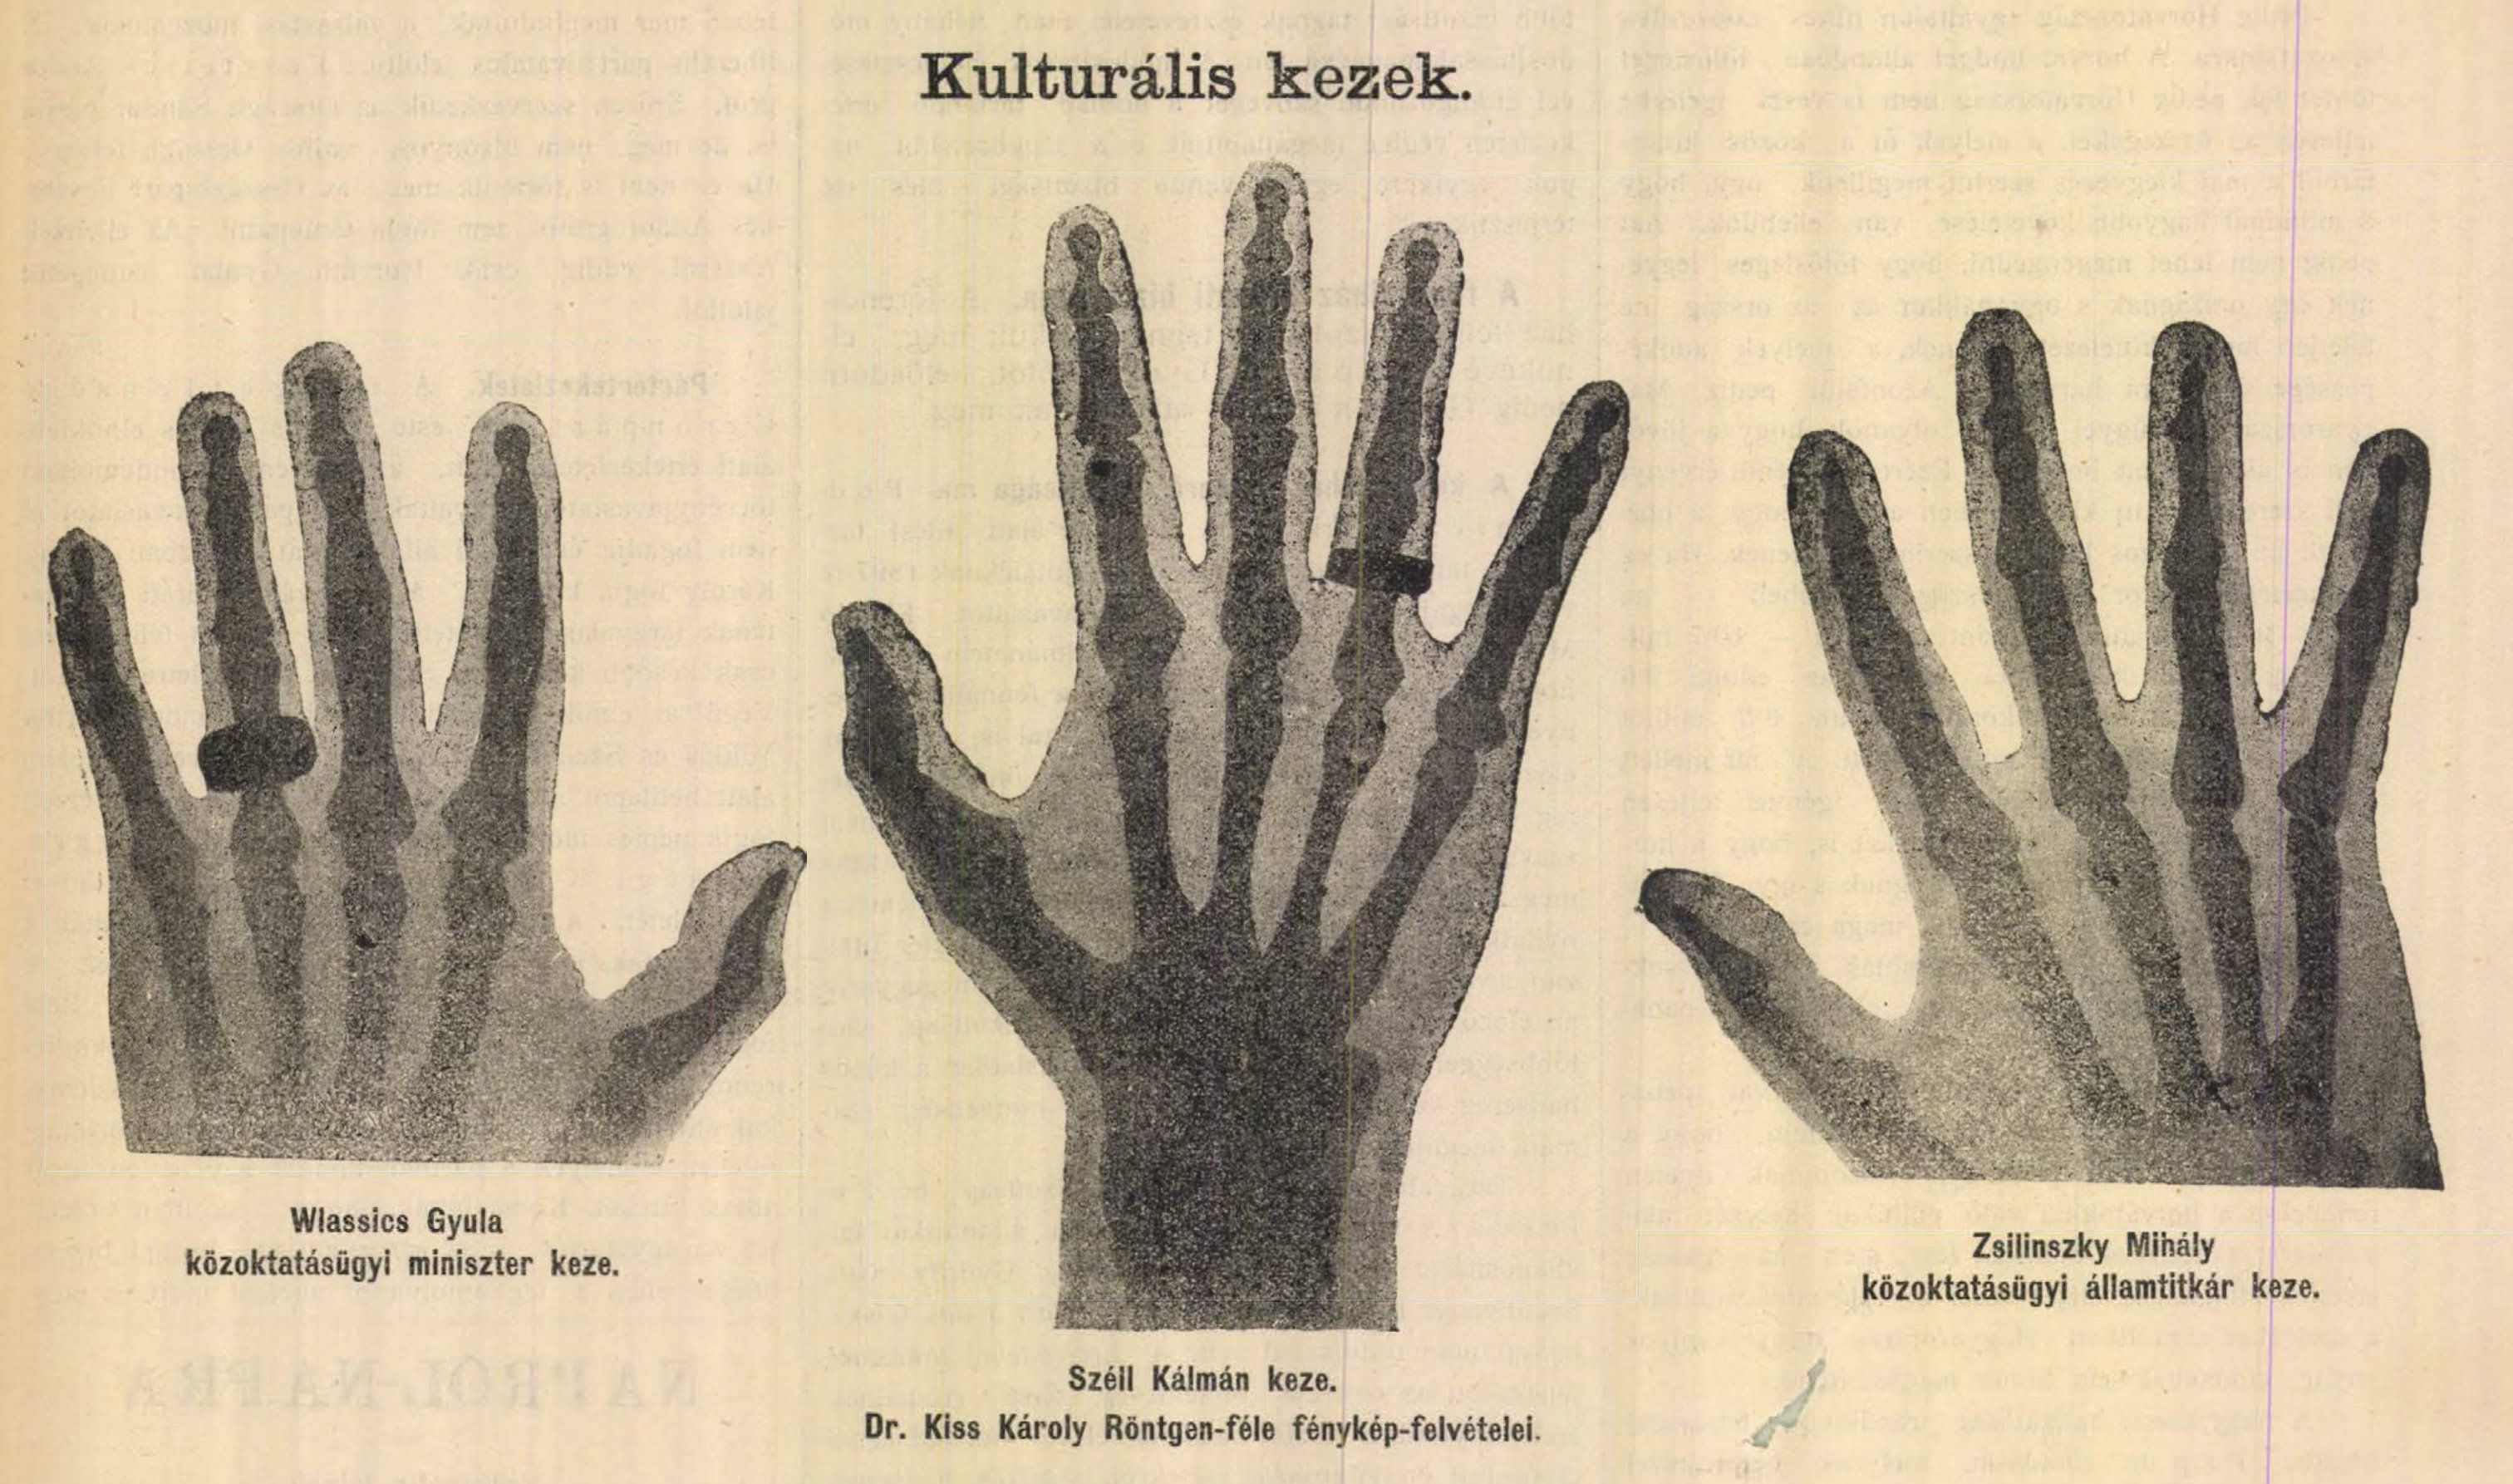 07_kulturalis_kezek_dr_kiss_karoly_felvetelei_fovarosi_lapok_1896_december_6.jpg